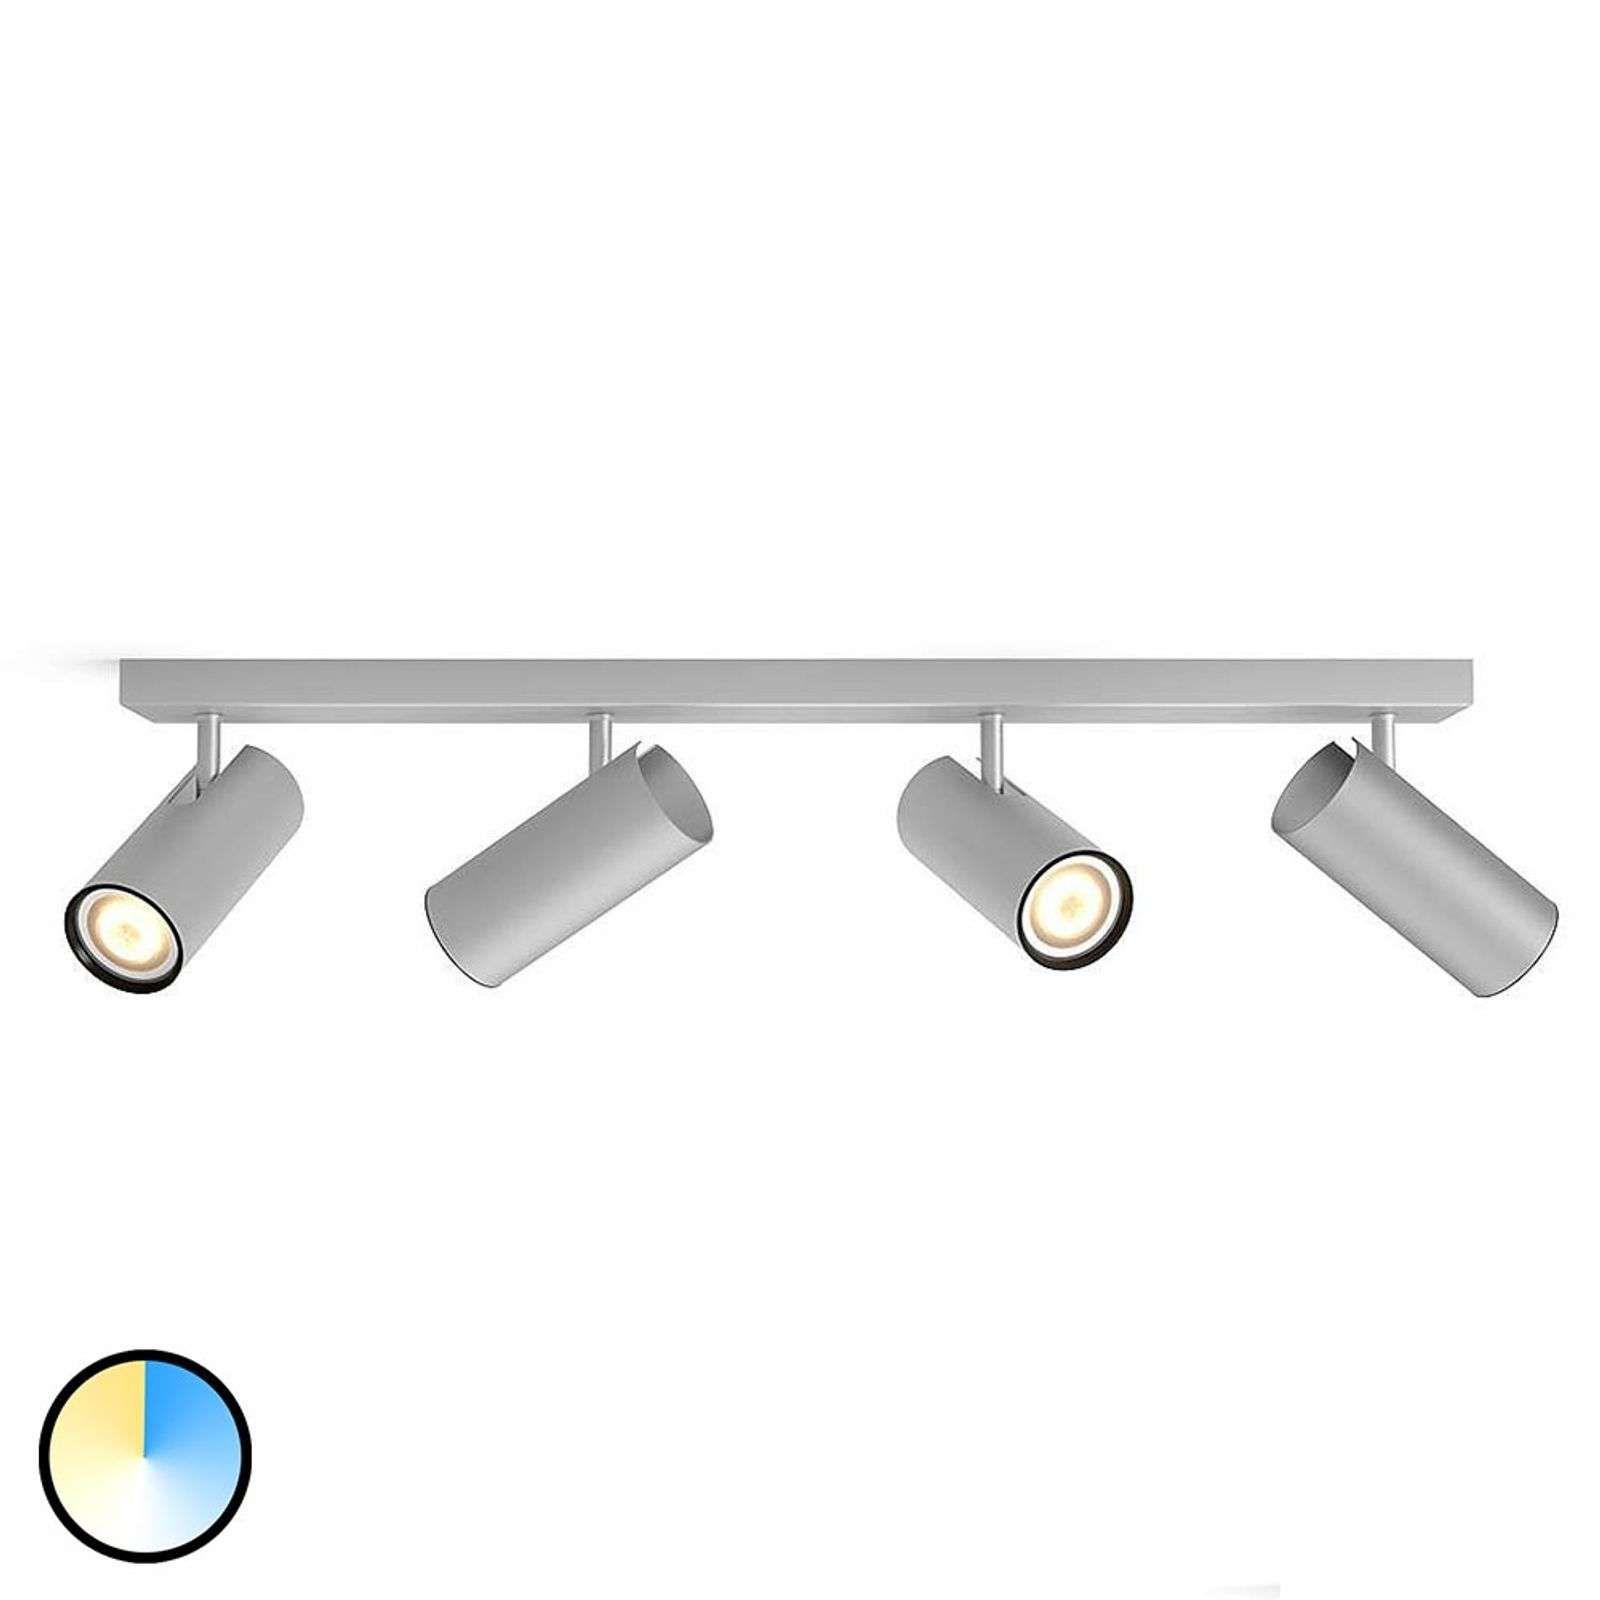 Philips Hue Buratto Spot Led Alu 4l Variateur Led Lampen Afstandsbediening